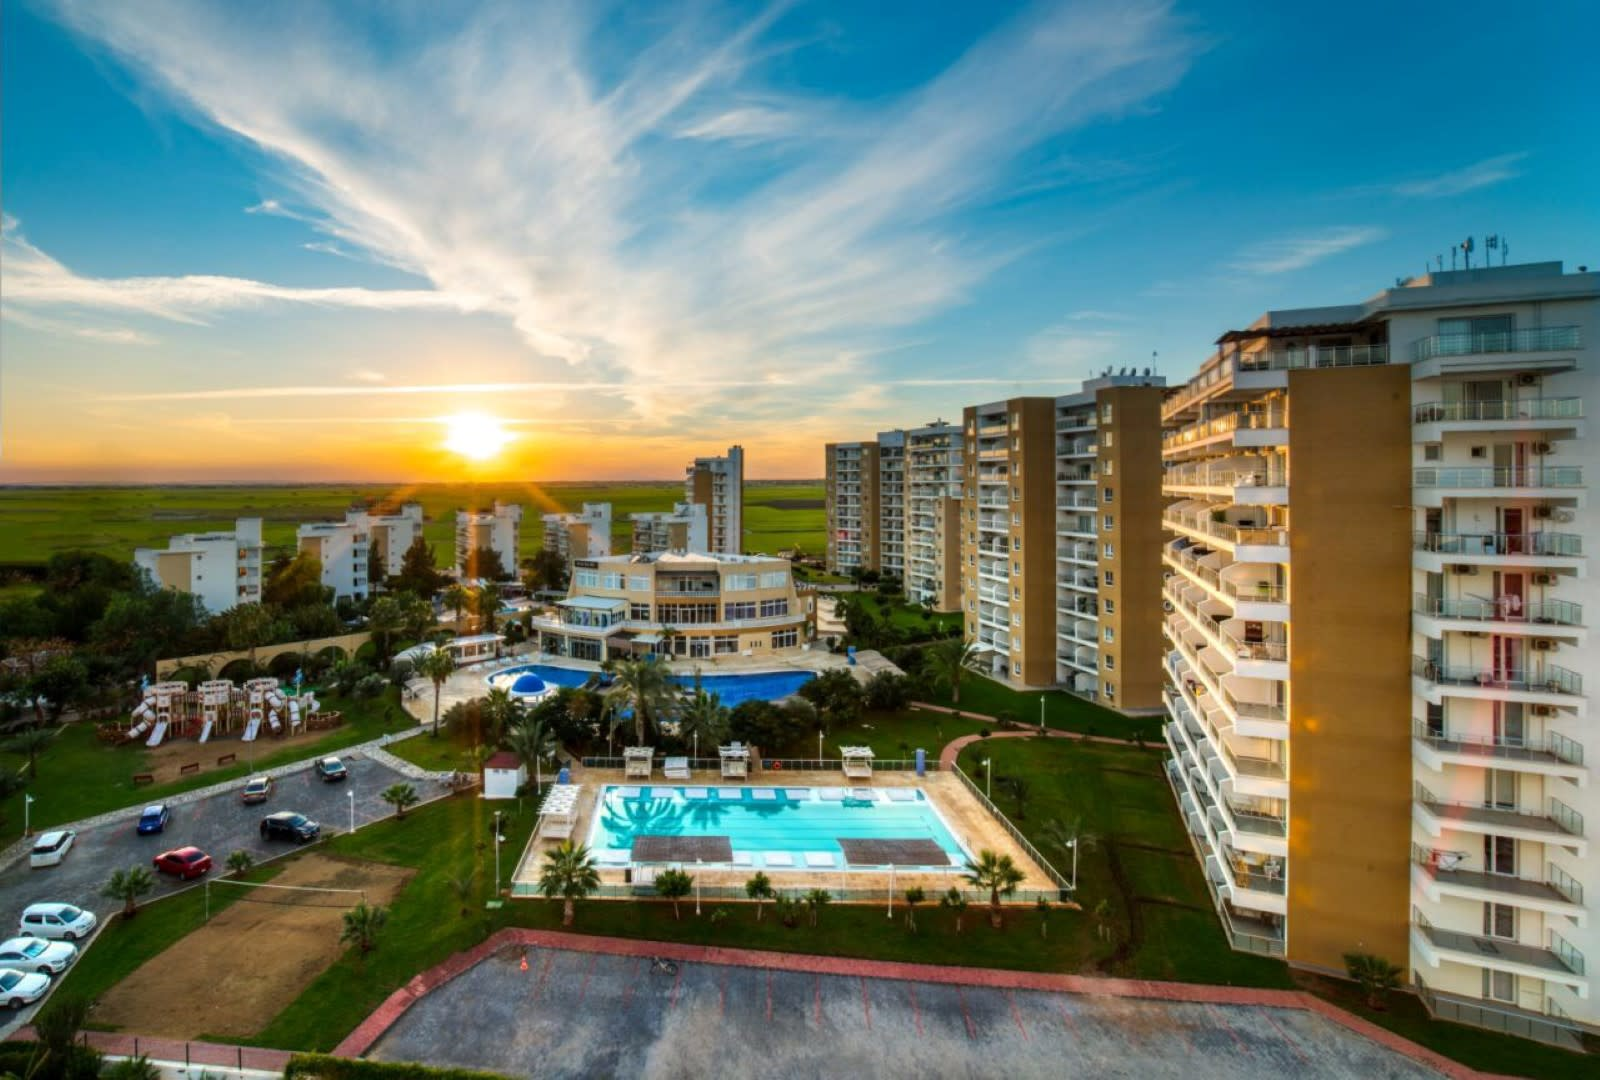 Long Beach İskele'de Lüks Rezidans'ta Satılık 3+1 Penthouse 8053